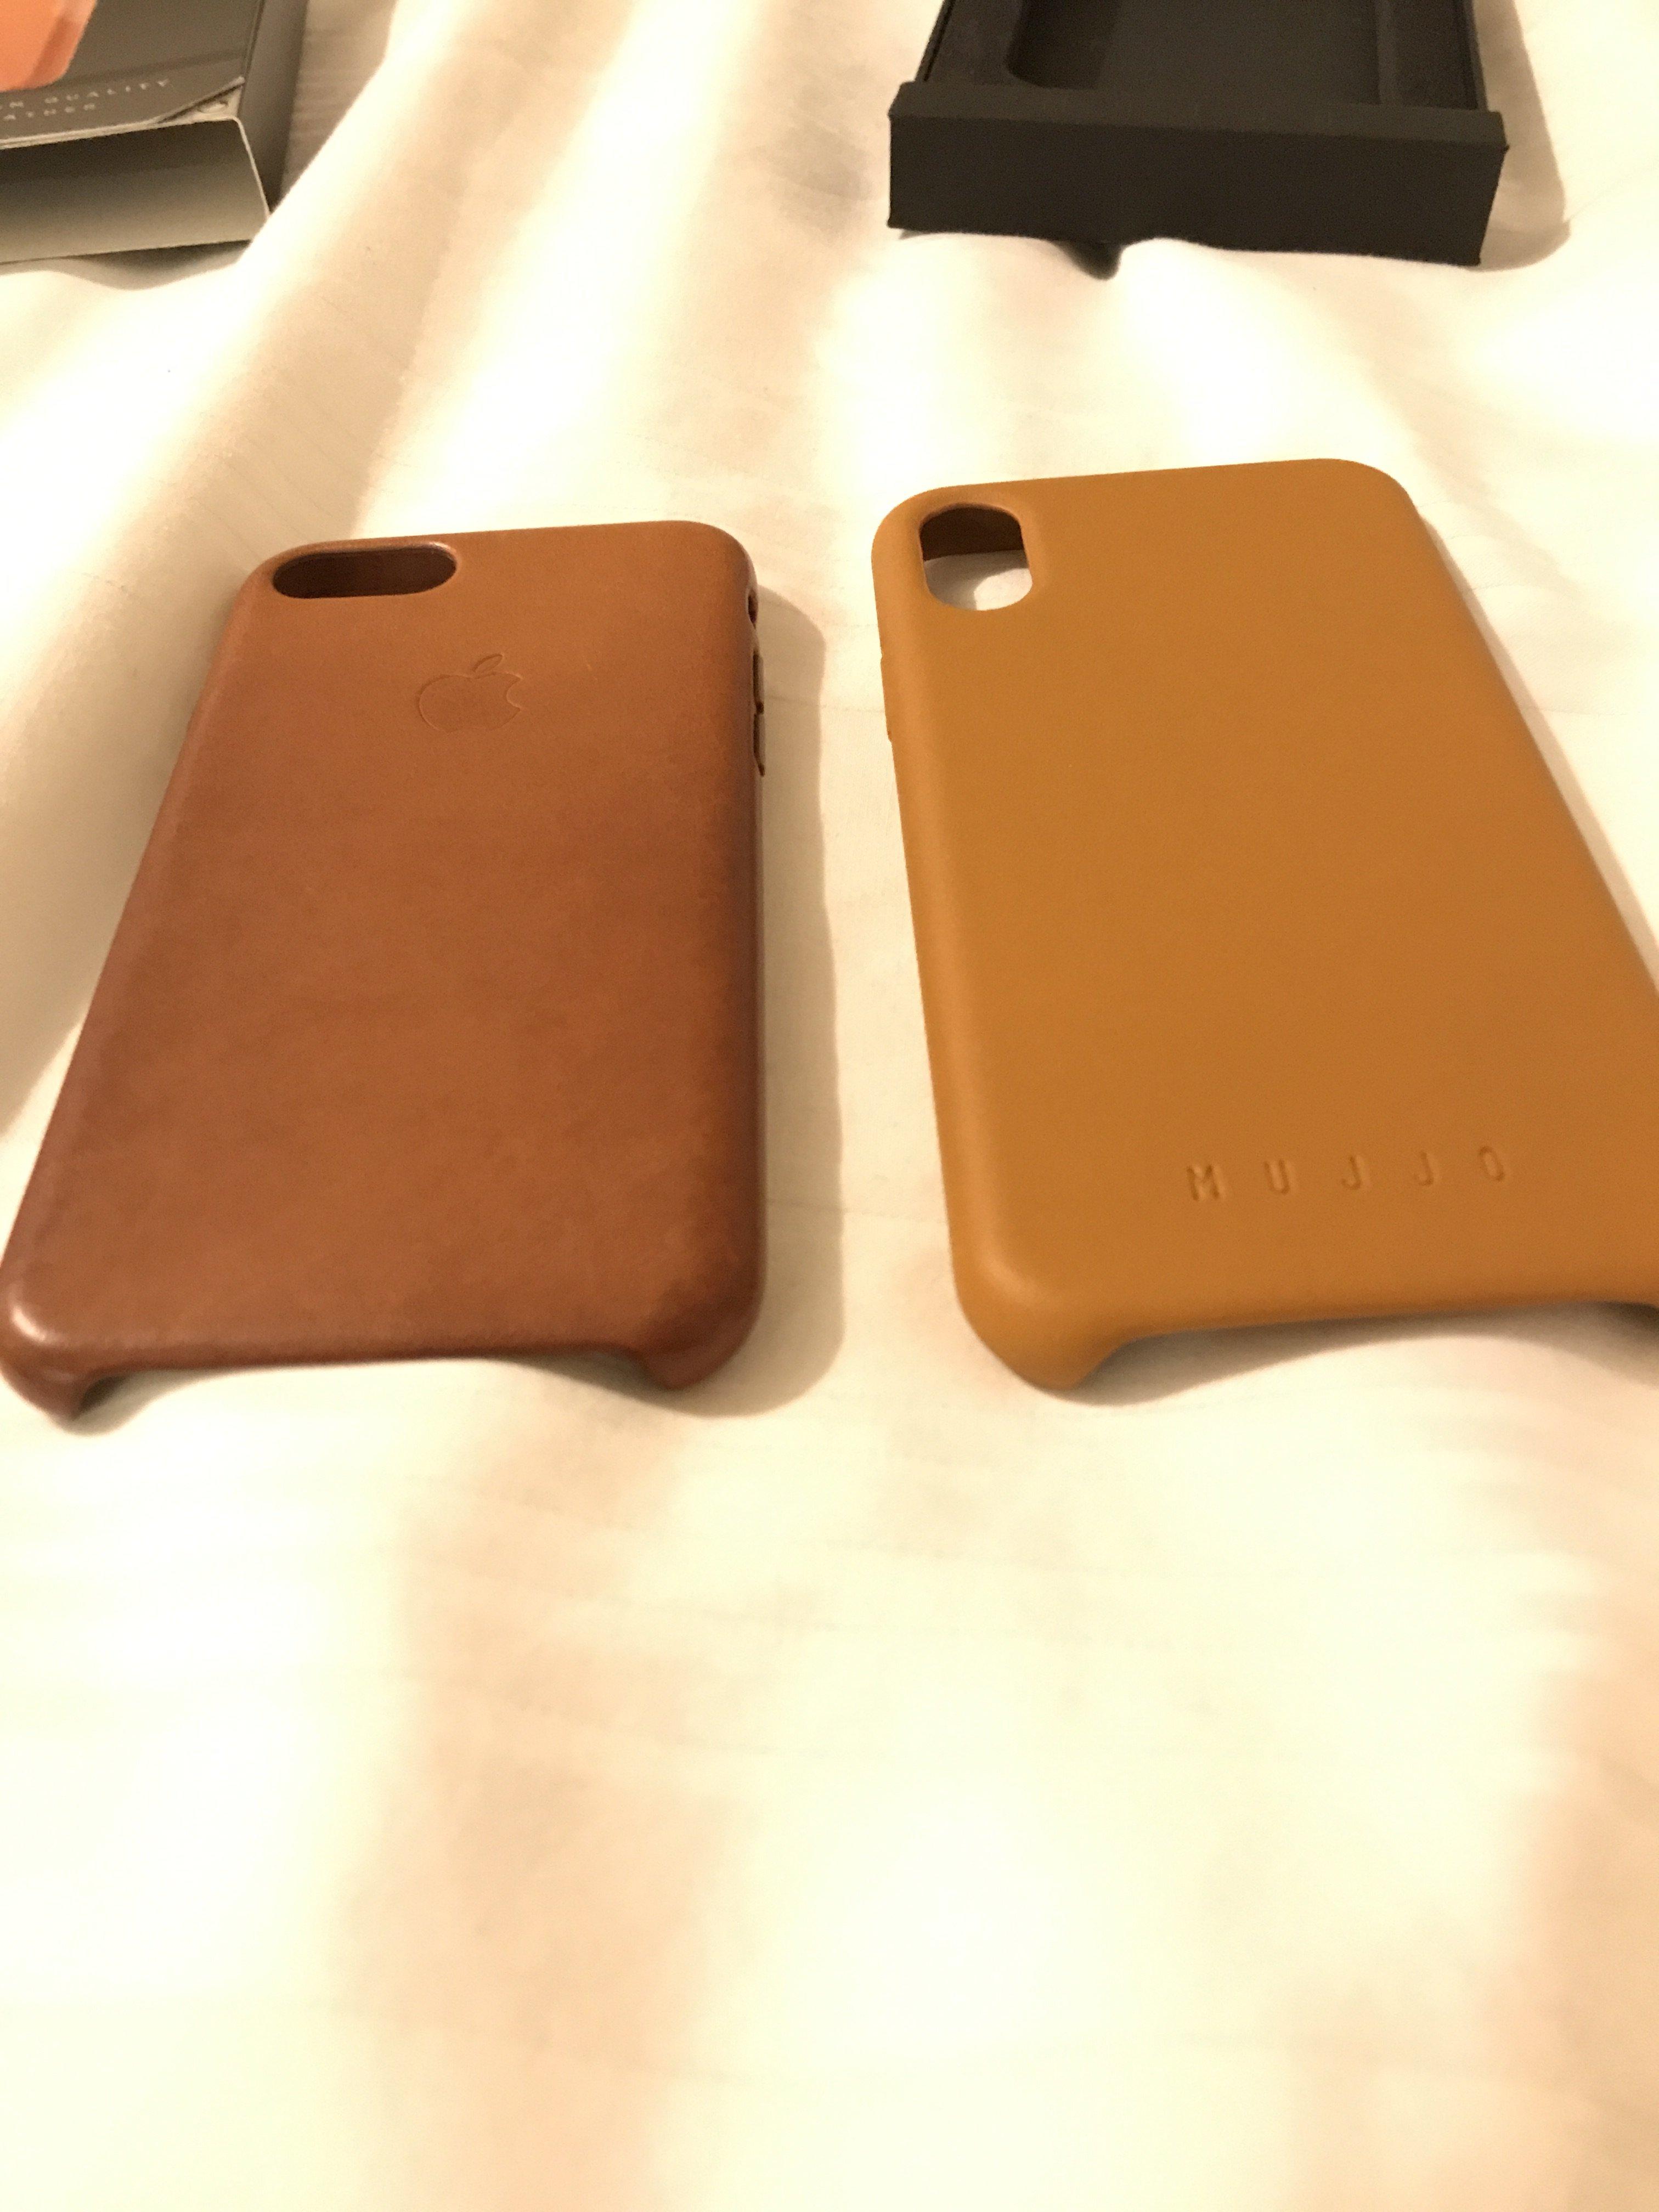 reputable site b41eb 2361a Mujjo leather case vs Apple | MacRumors Forums